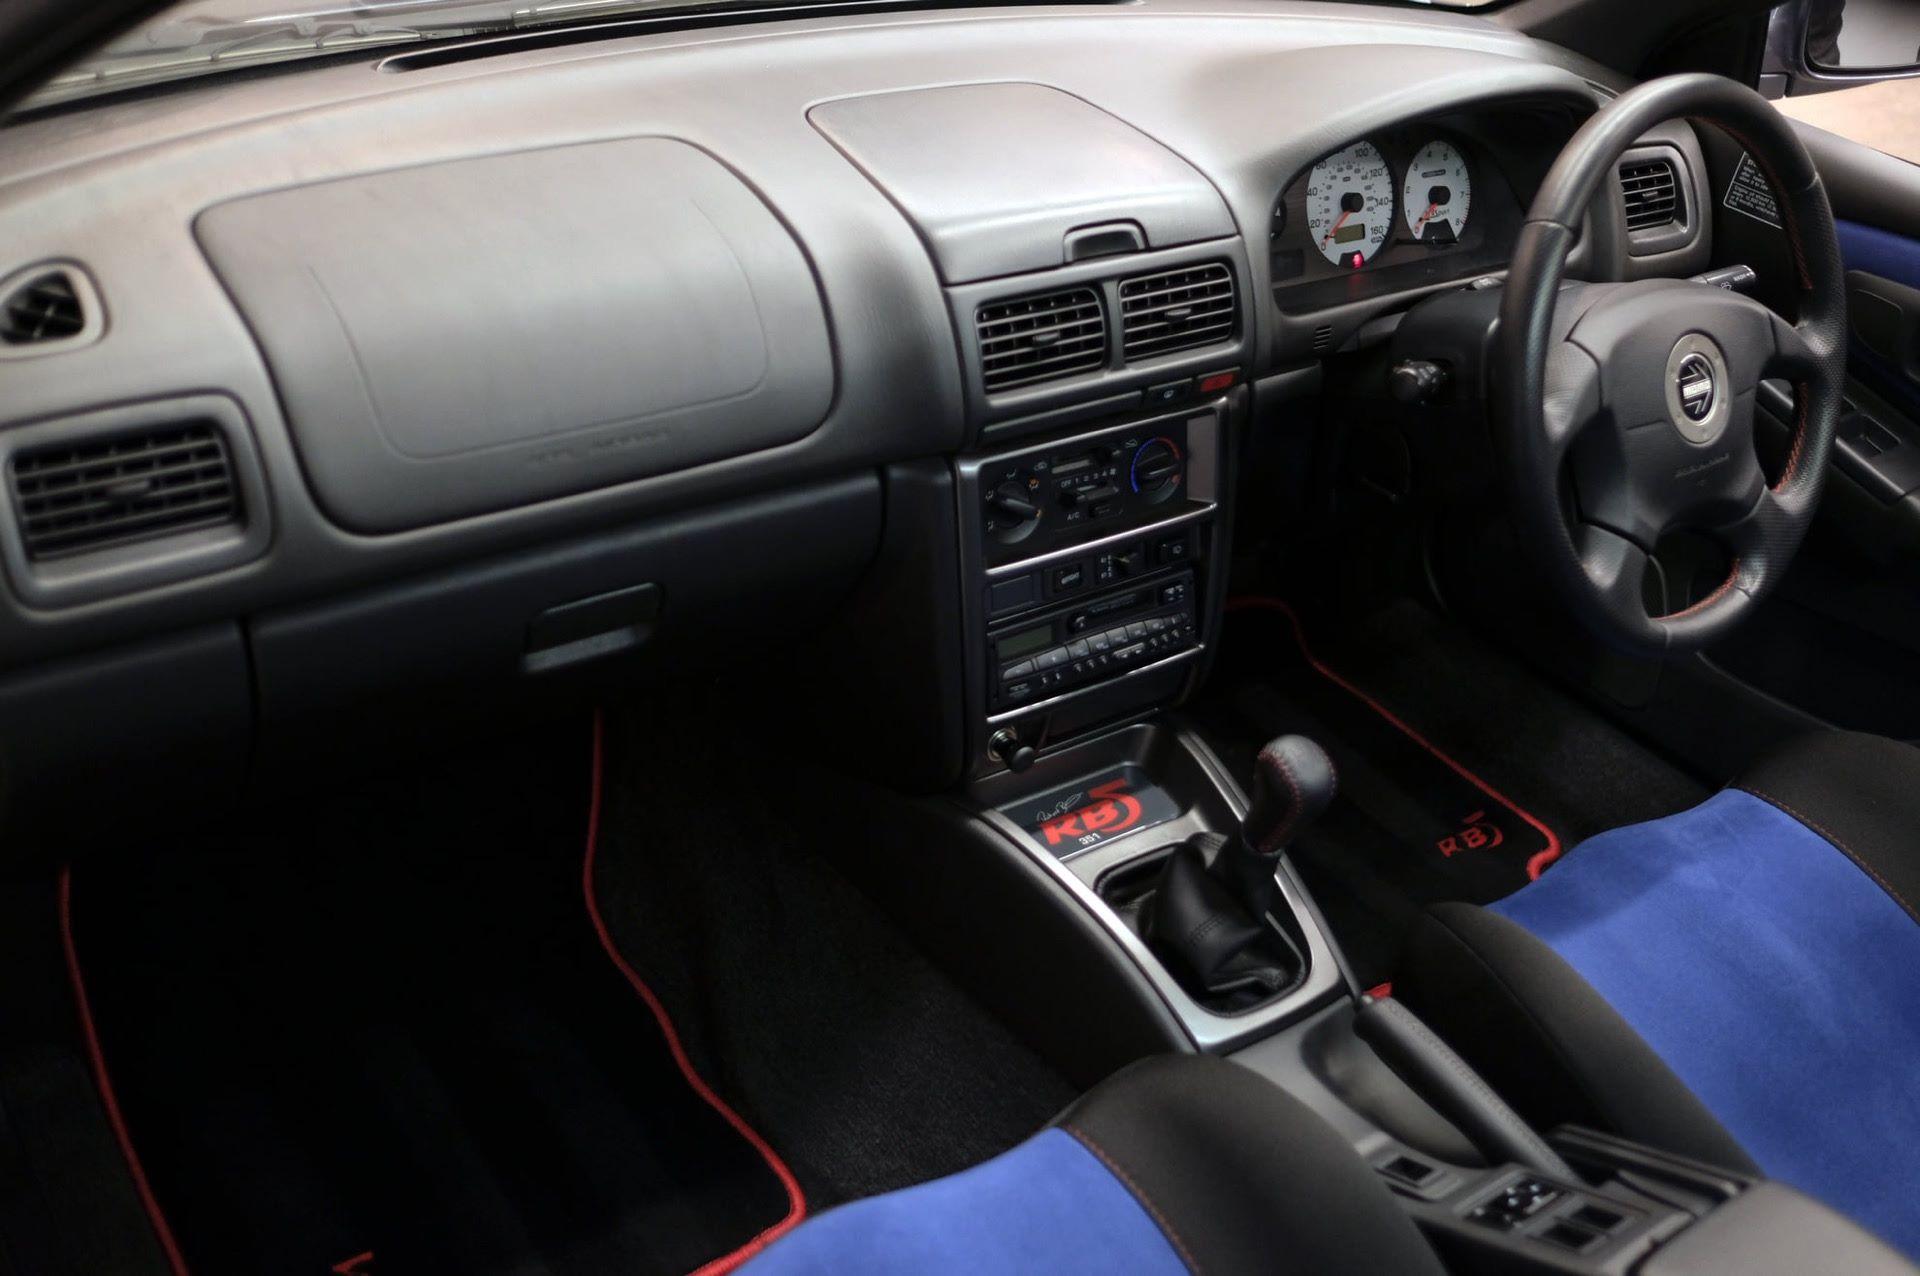 Subaru-Impreza-RB5-1999-20